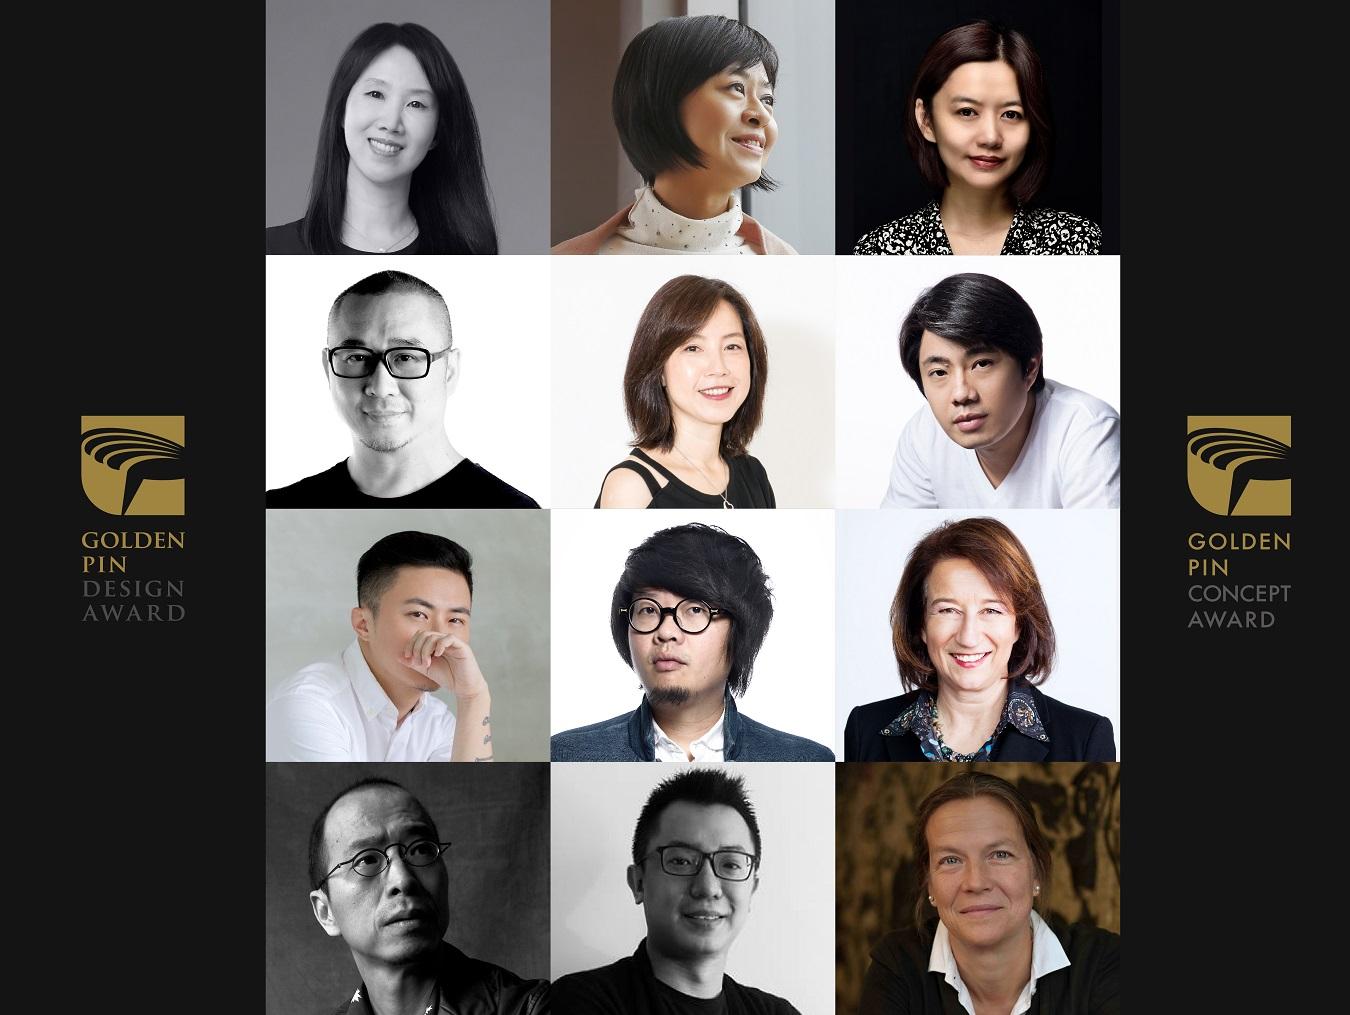 Golden Pin Design Award & Golden Pin Concept Design Award 2019 Jury List Announced